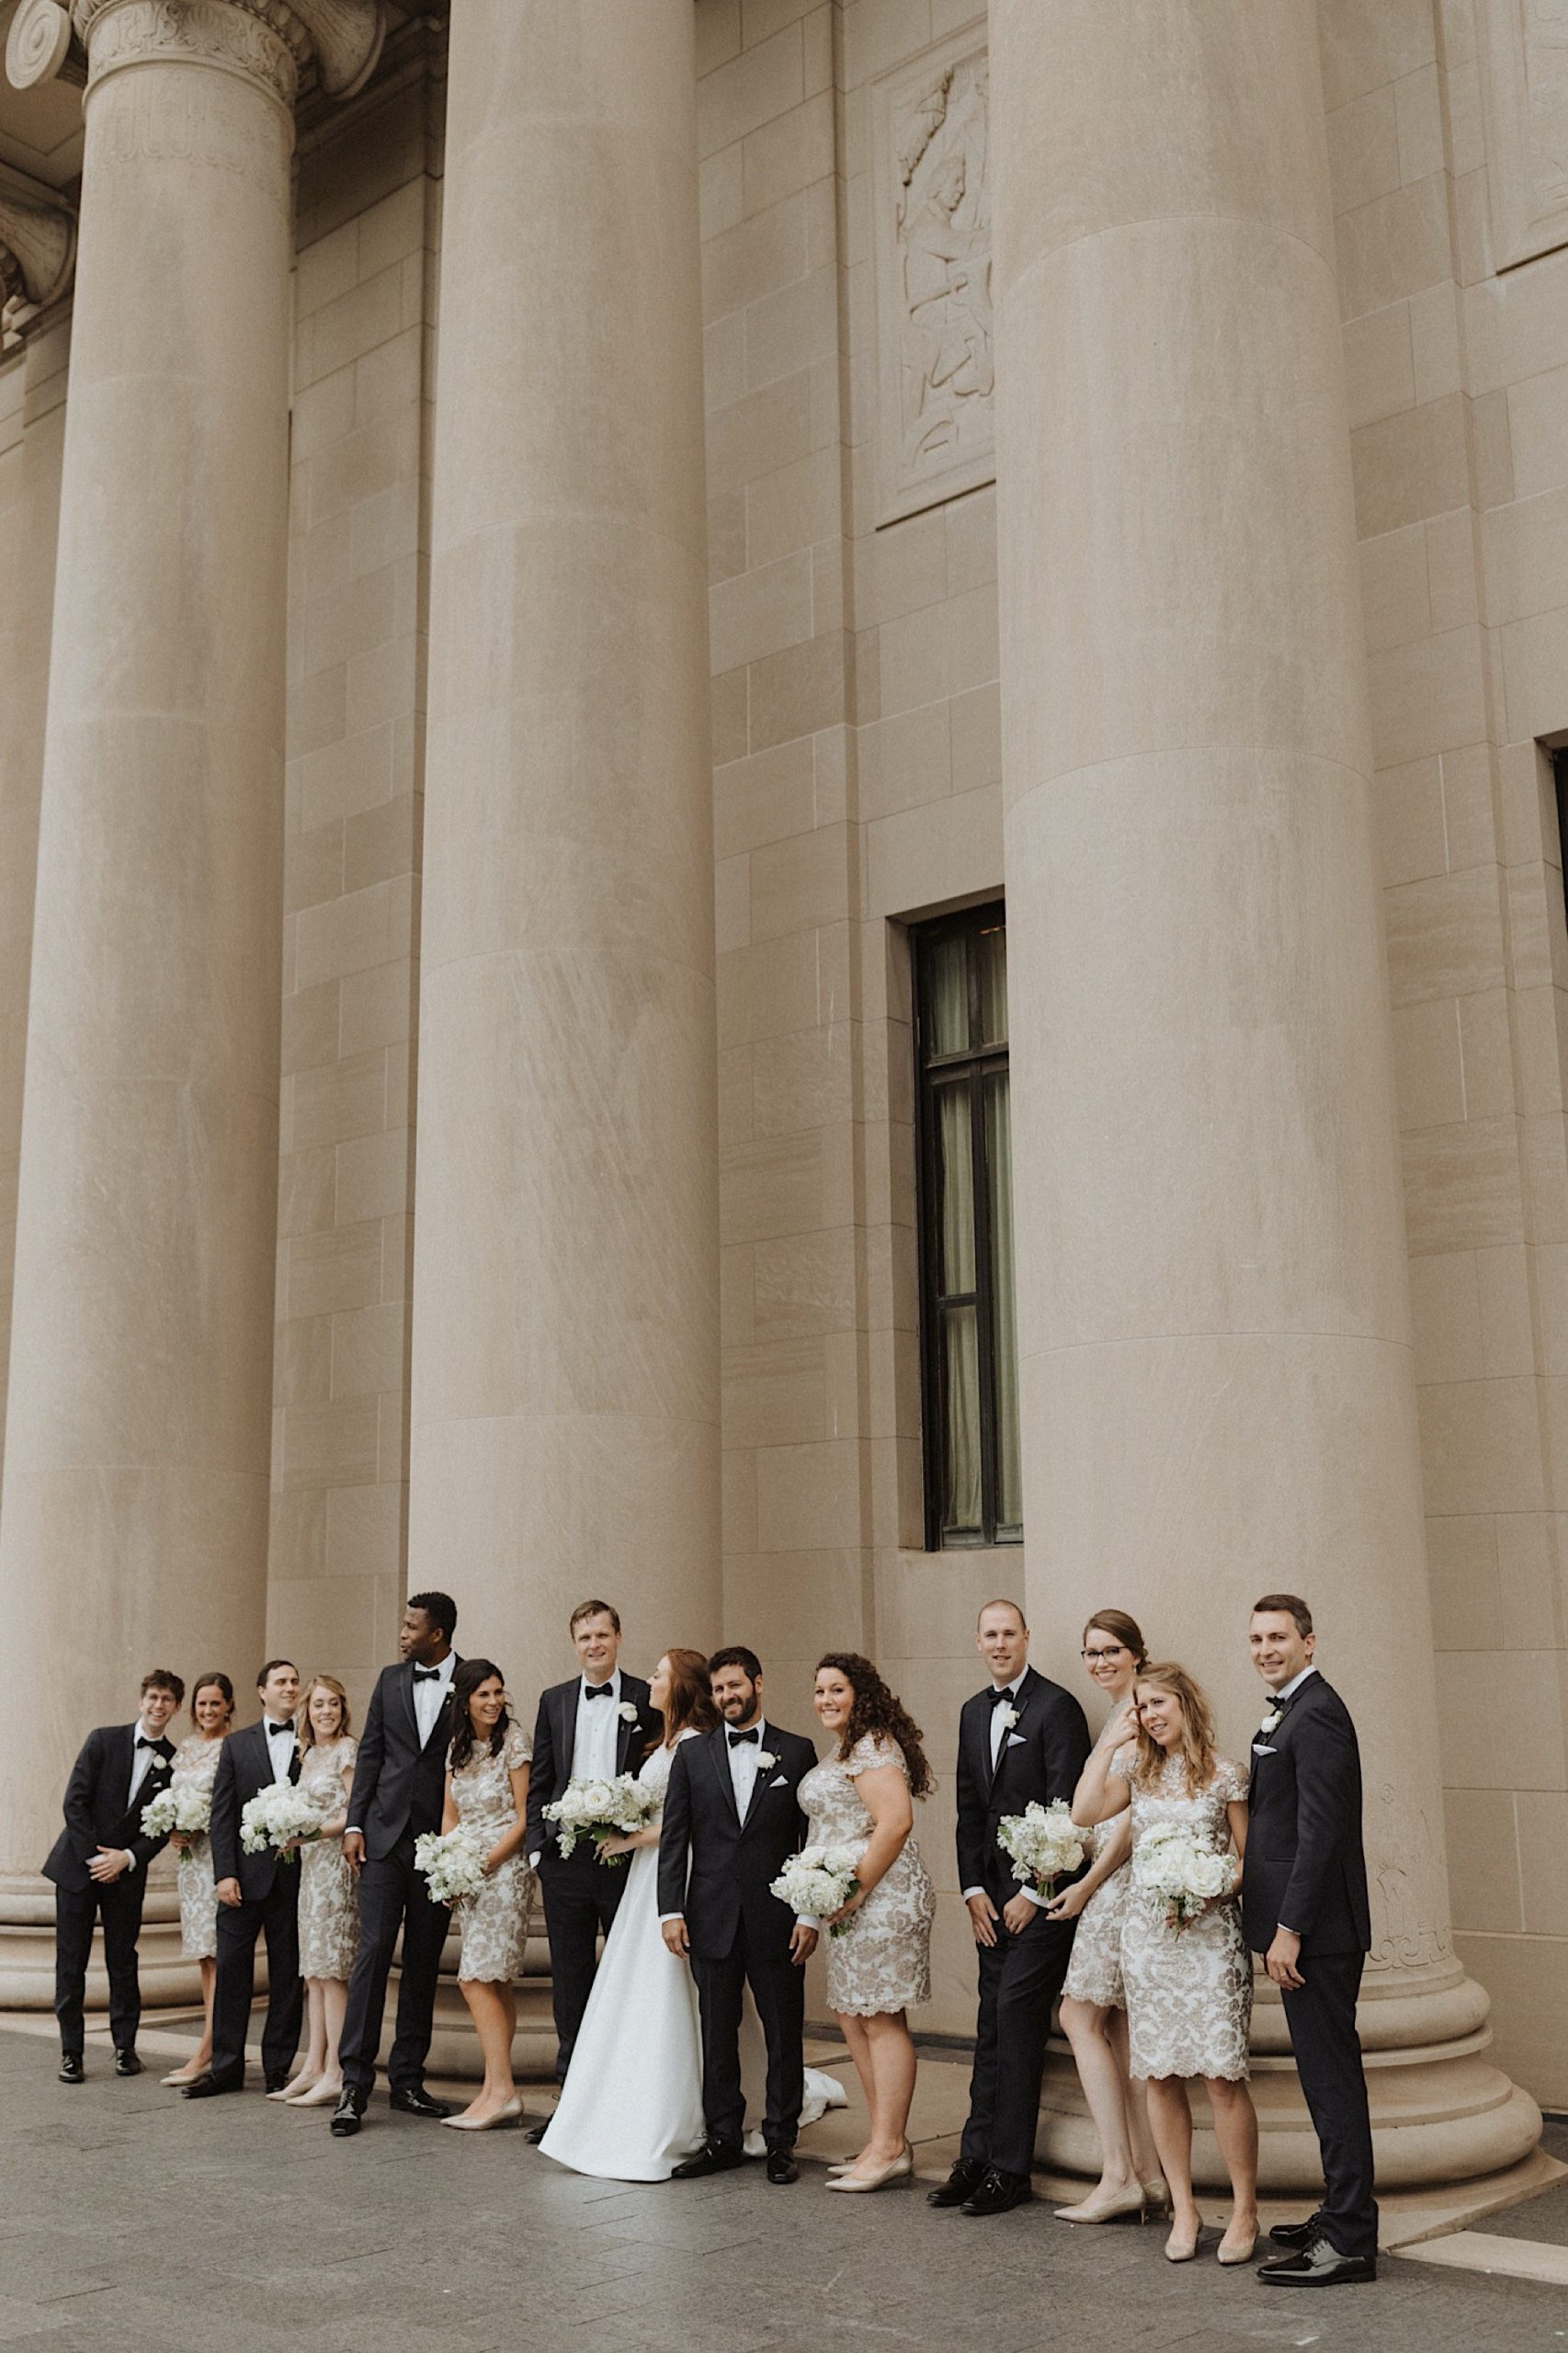 Kansas City wedding at the nelson Atkins museum